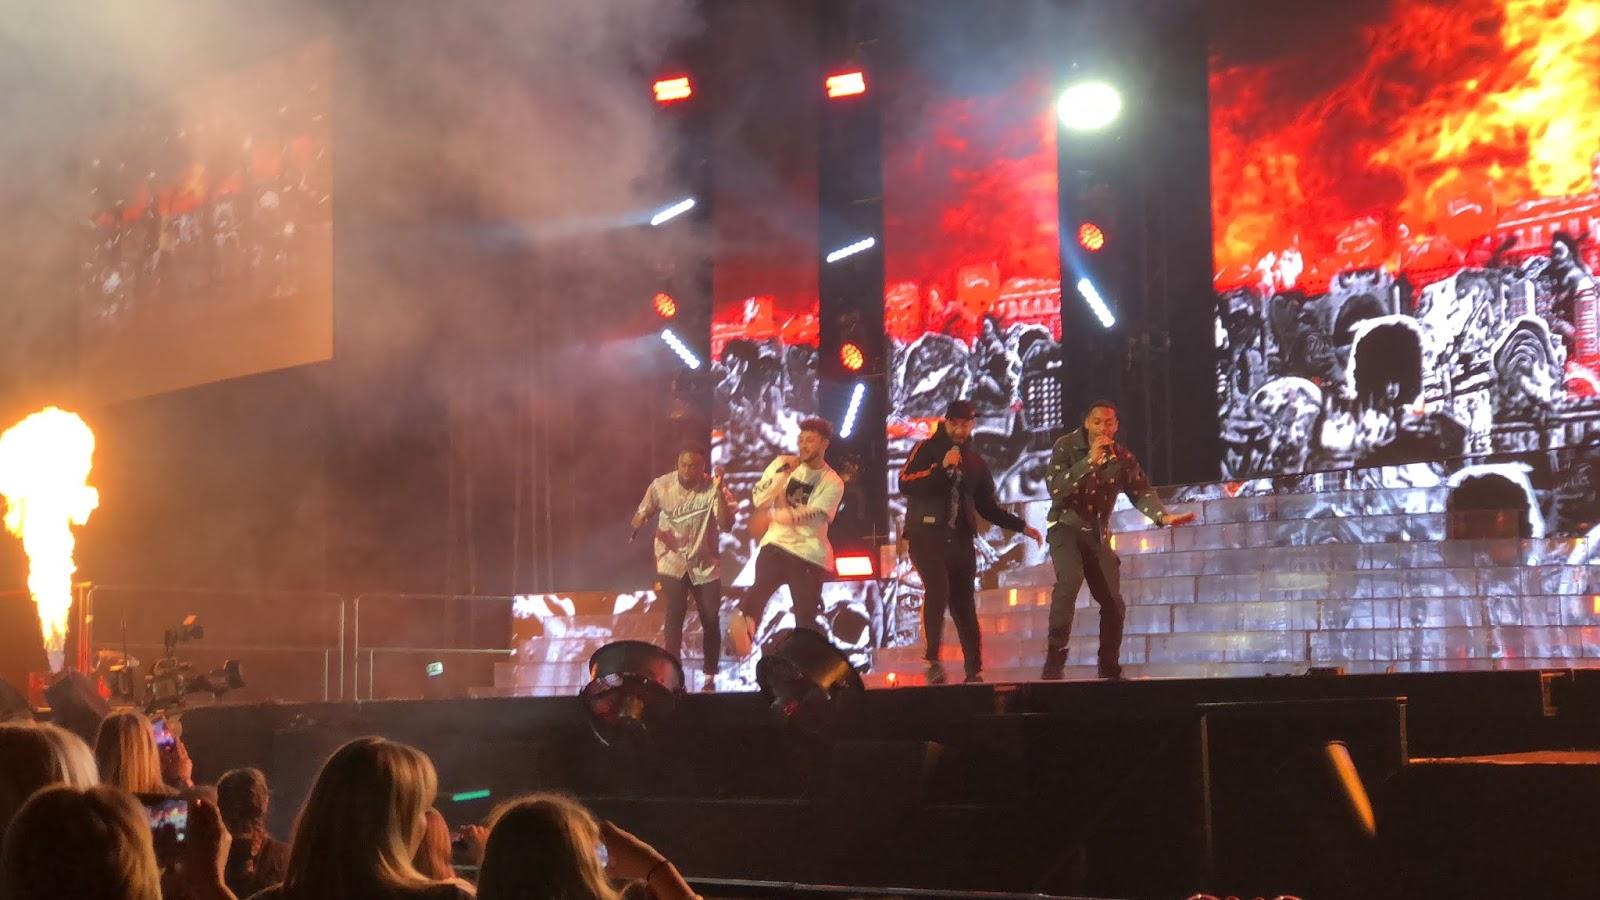 Rak-su, X factor, Concert, Live